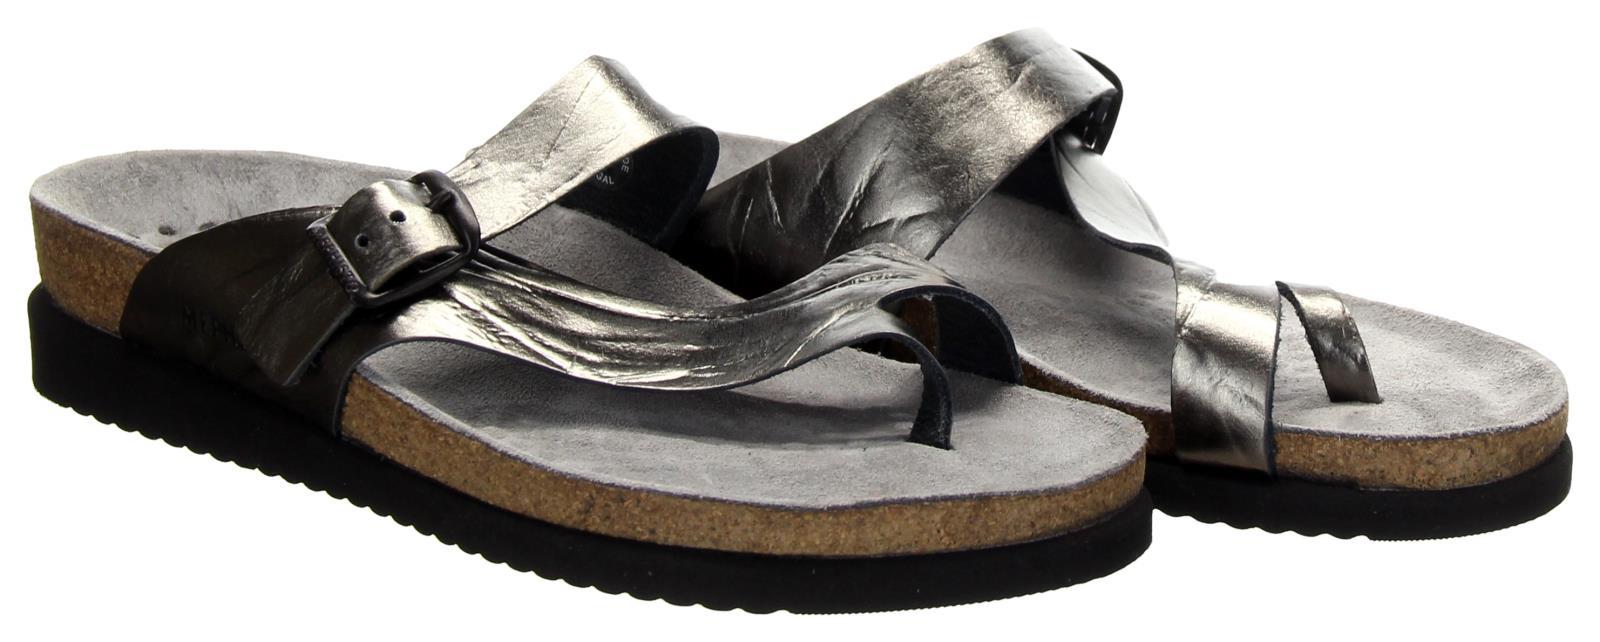 Mephisto Helen Water-Repellent Nubuck Slip-on Sandals Silver Sz 39